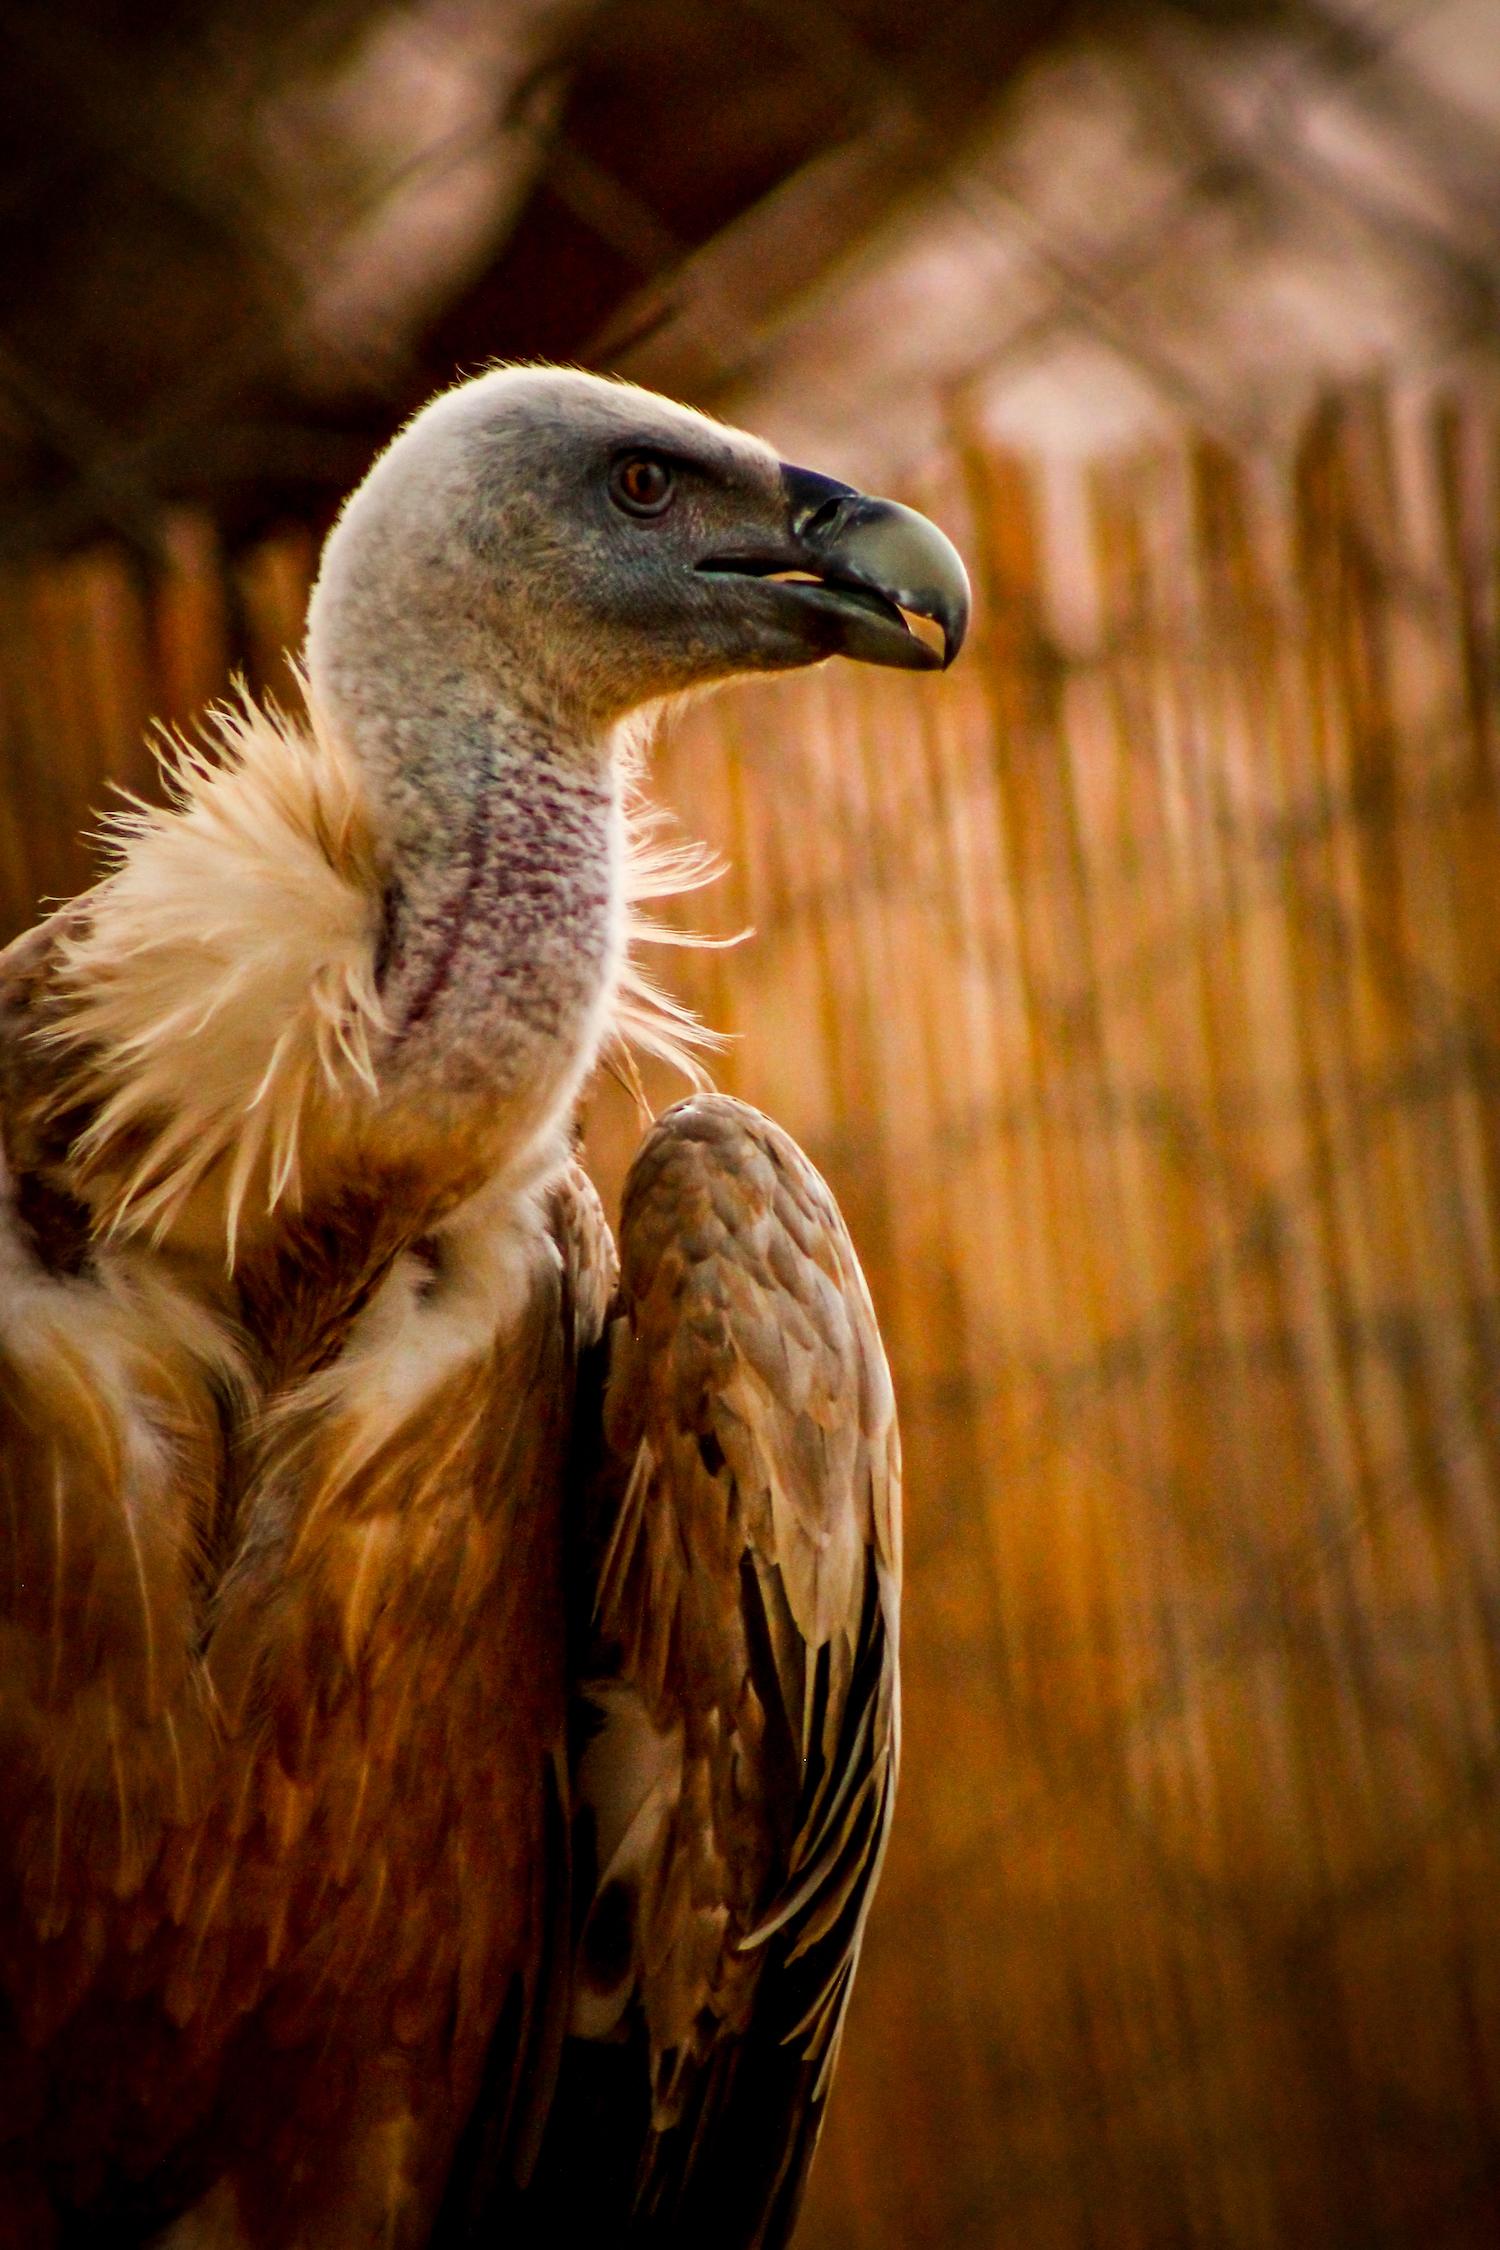 Vulture, Israel, Canon DSLR